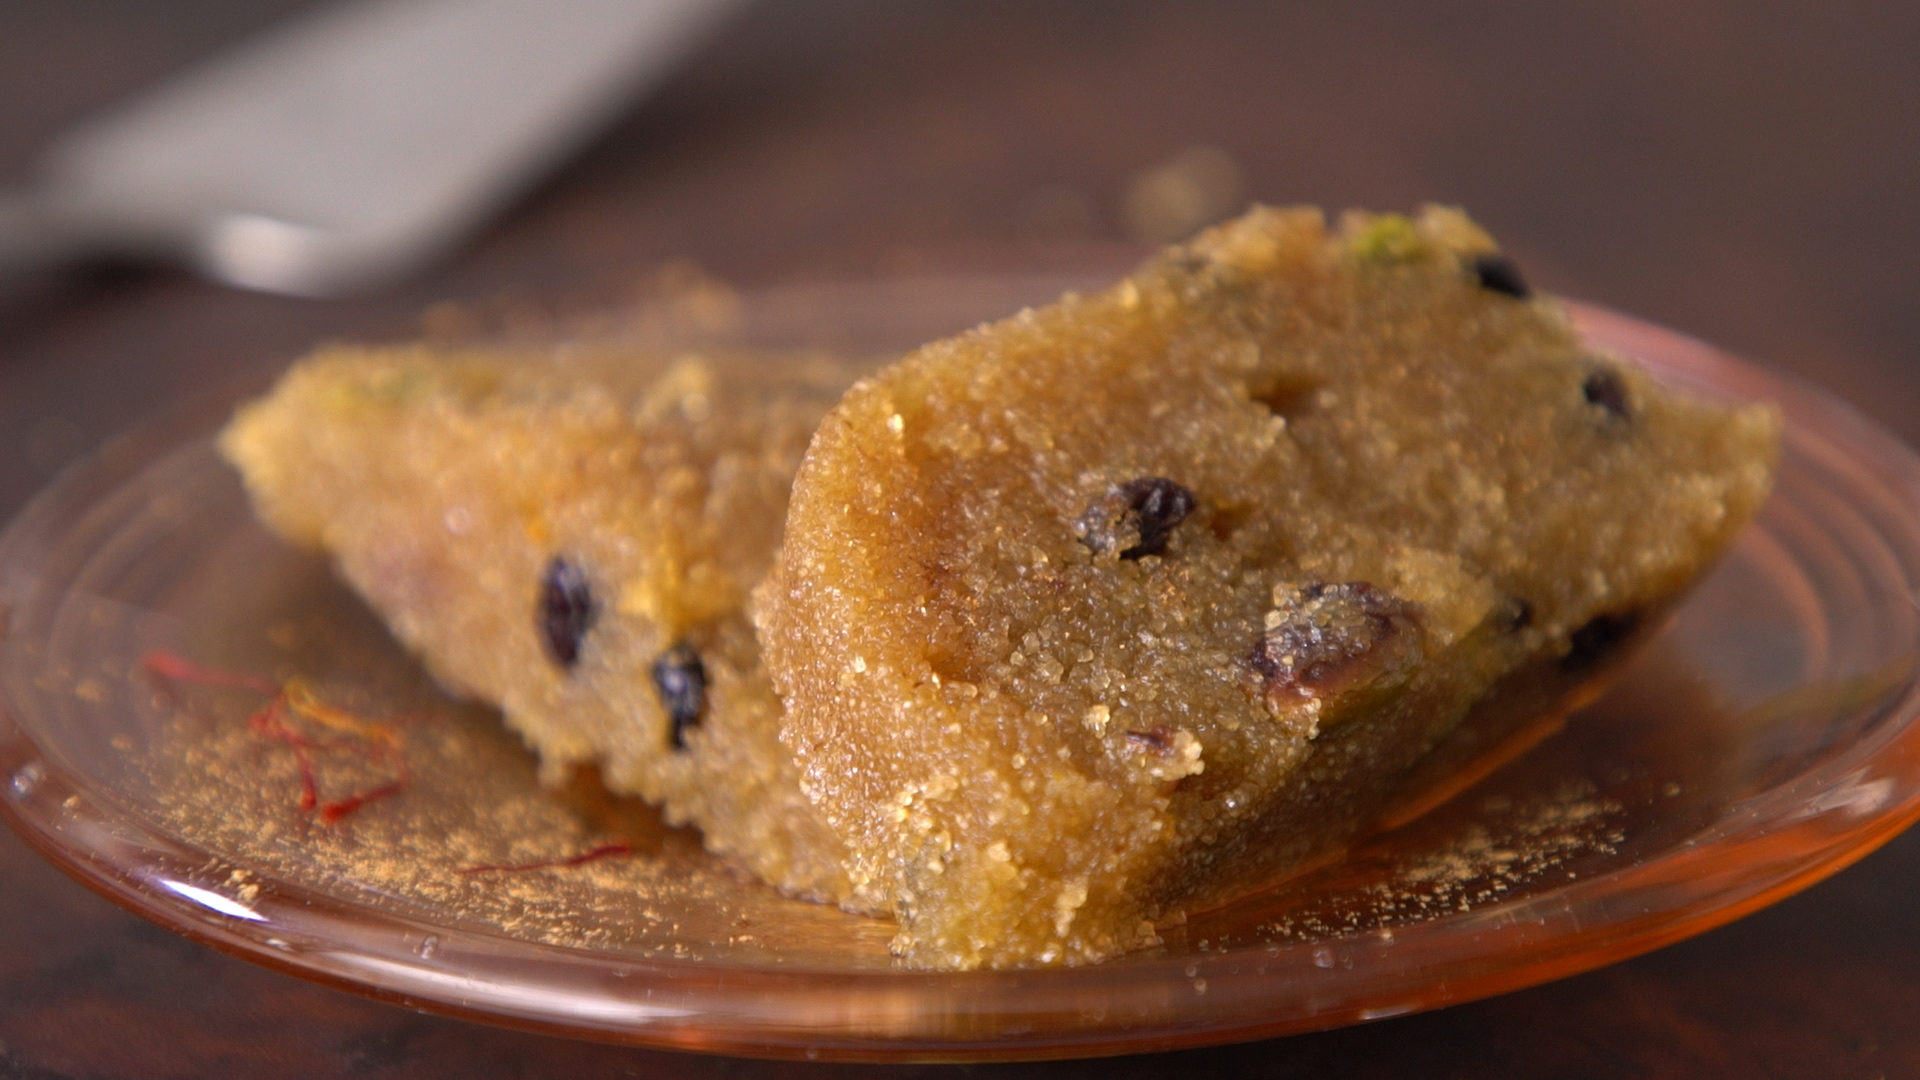 Halva Orange Spiced Semolina Pudding Cake With Dried